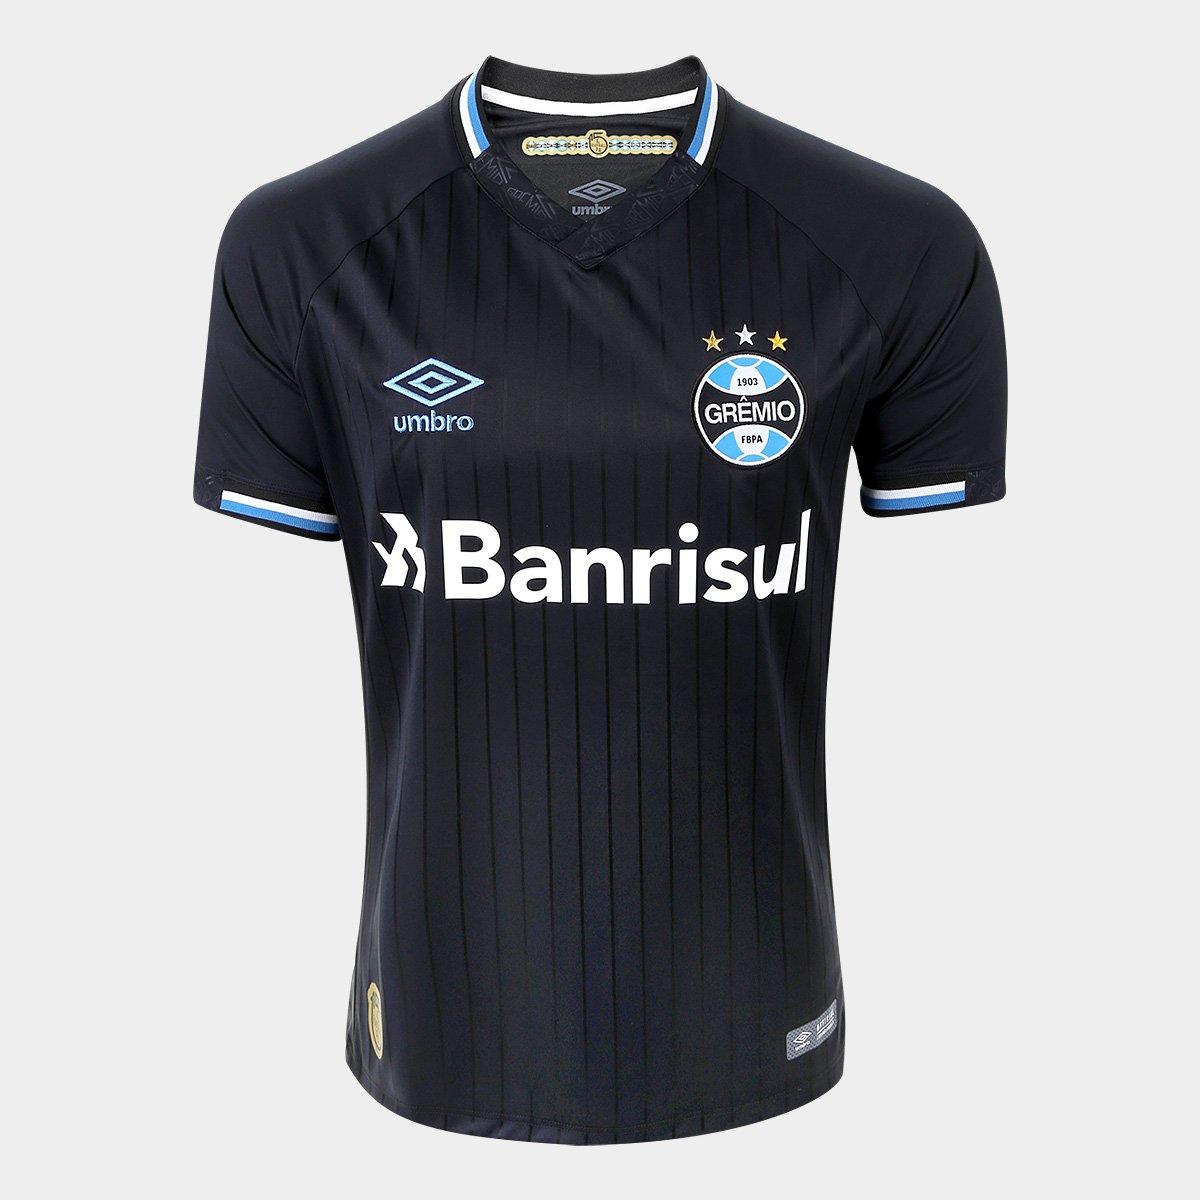 86b1453a8ffee Camisa Grêmio III 2018 s n° Torcedor Umbro Masculina - Preto e Branco -  Compre Agora